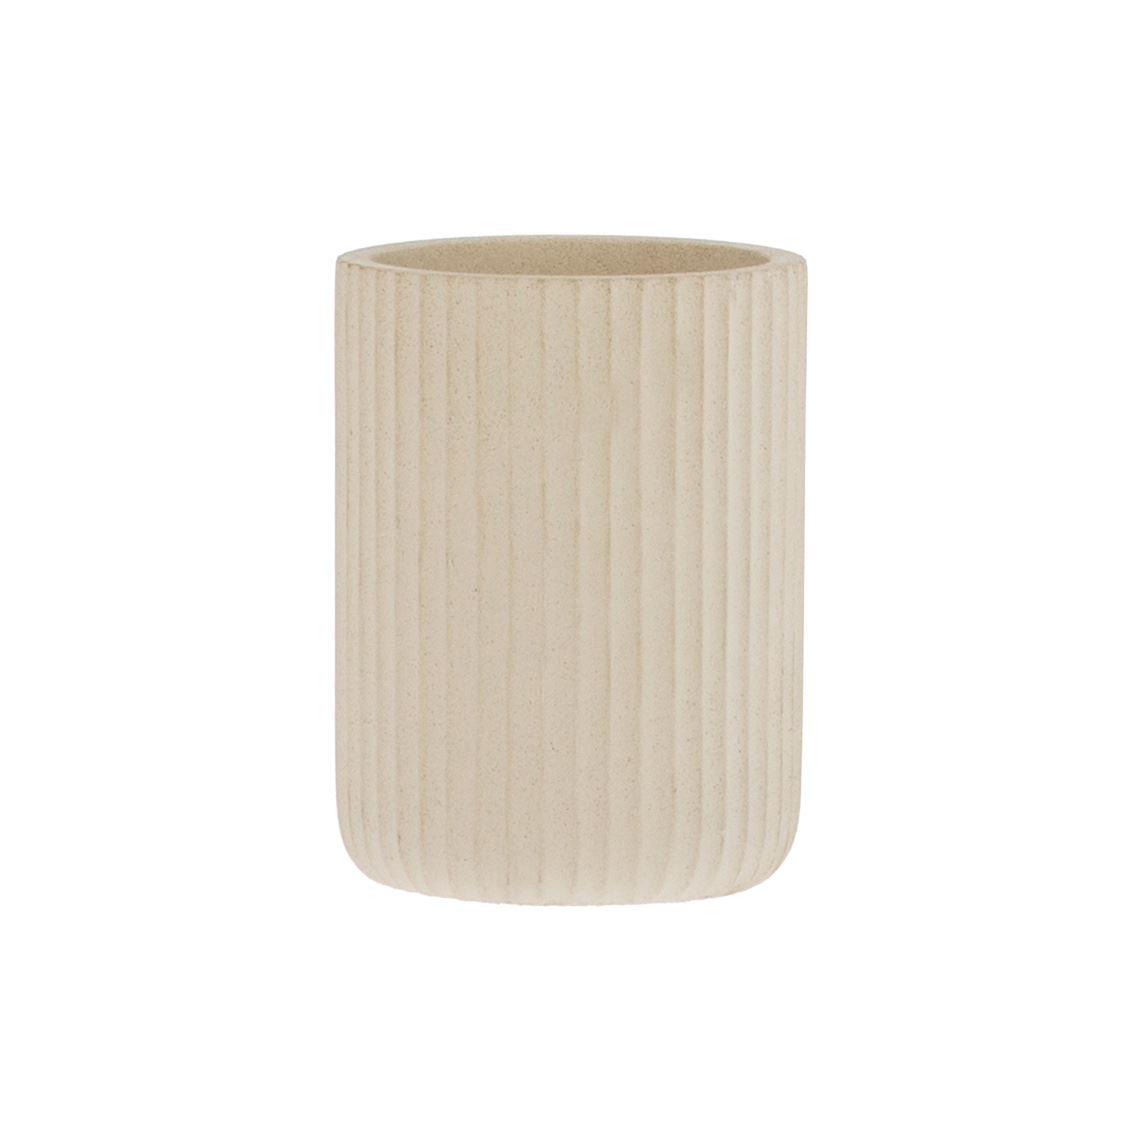 Marial Tumbler Size W 8cm x D 8cm x H 10cm in White Freedom